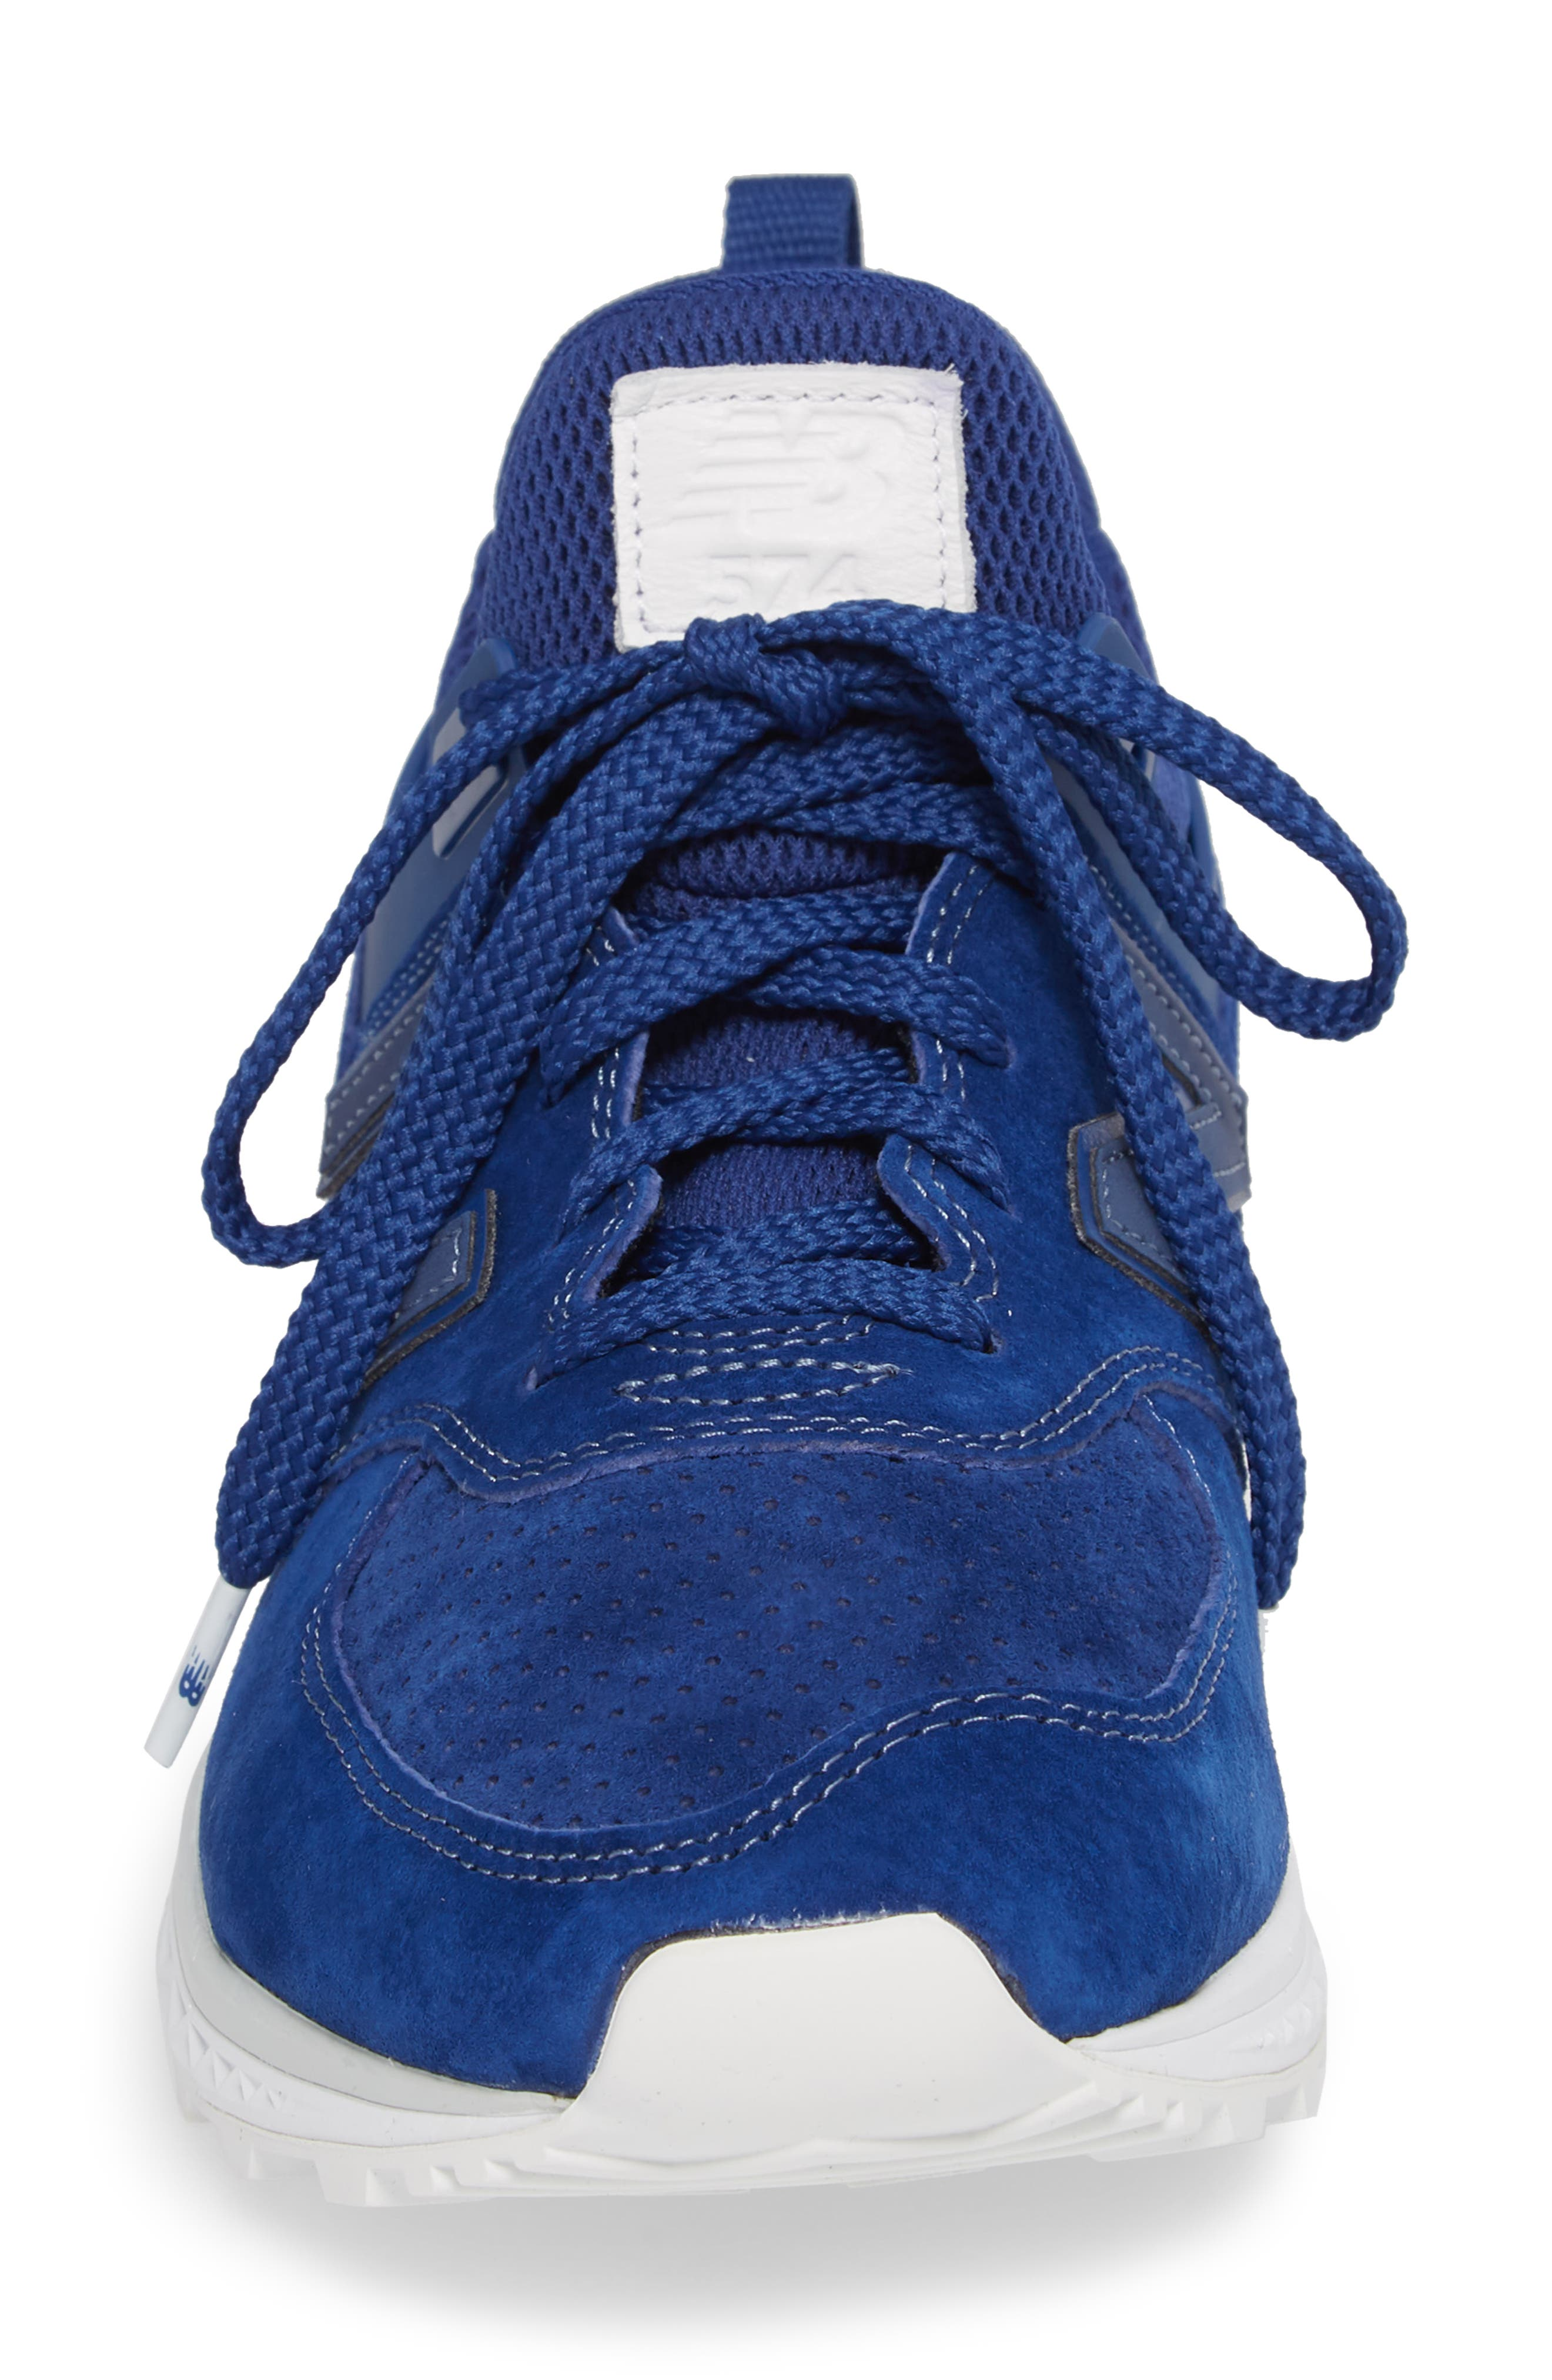 574 Sport Sneaker,                             Alternate thumbnail 4, color,                             Atlantic